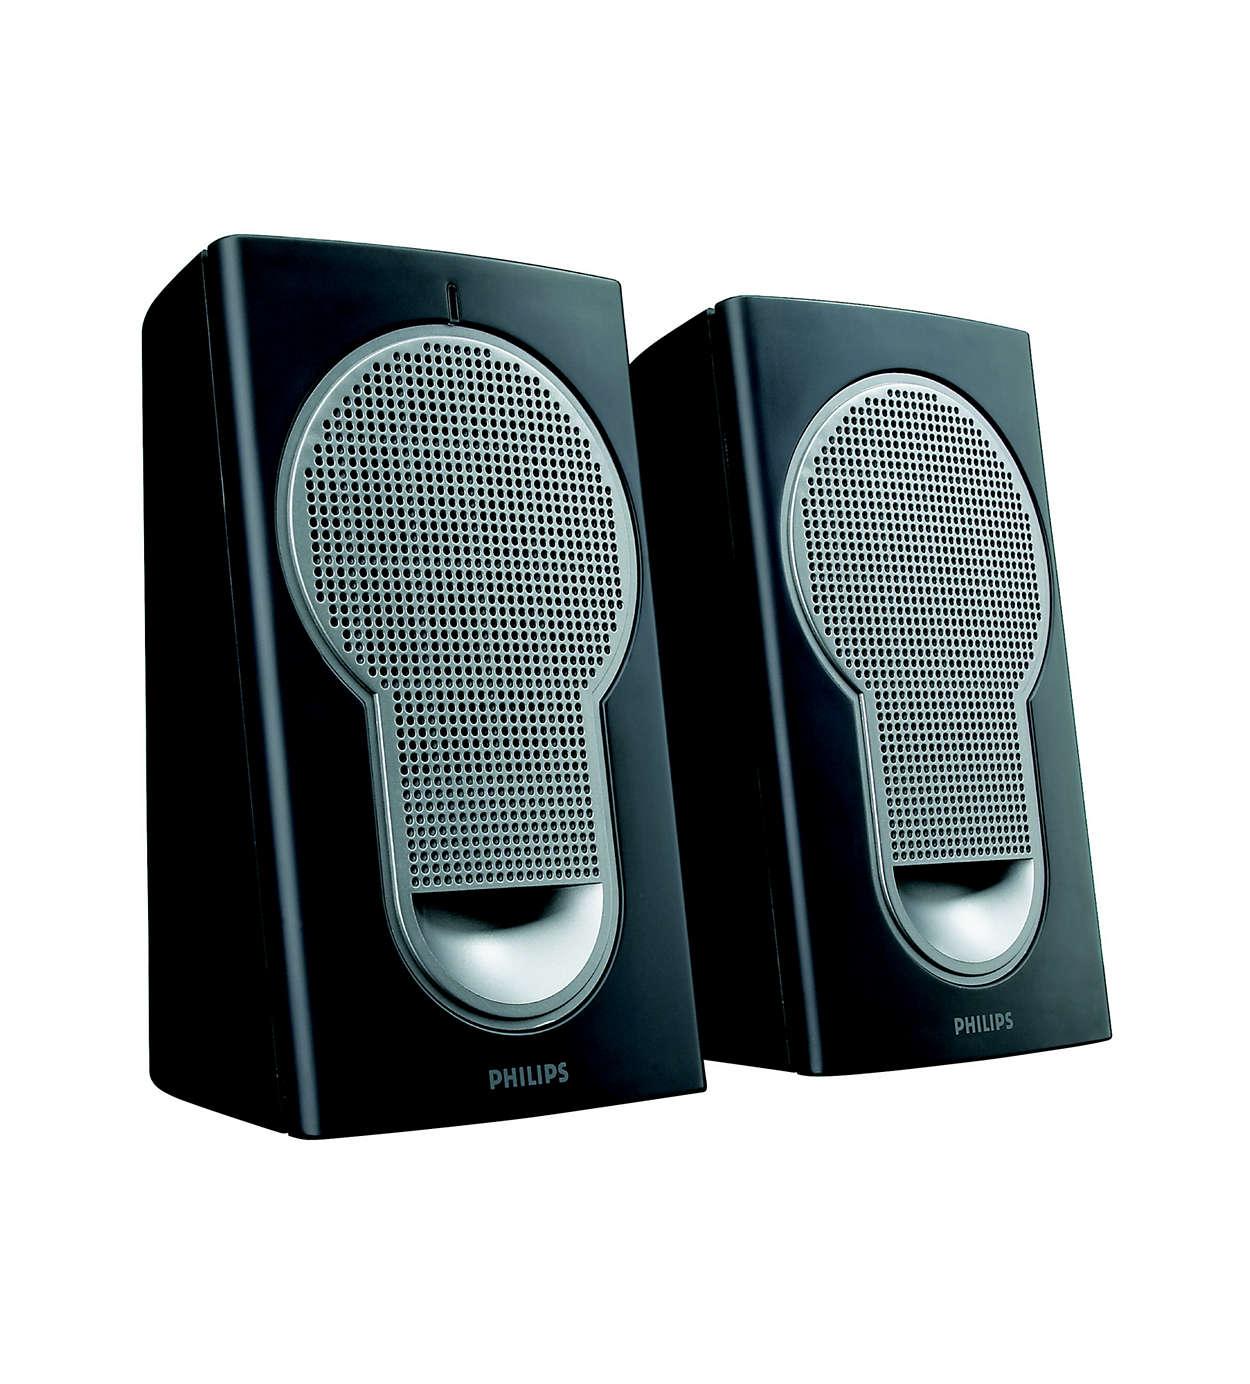 Compacte luidsprekers, geweldig geluid